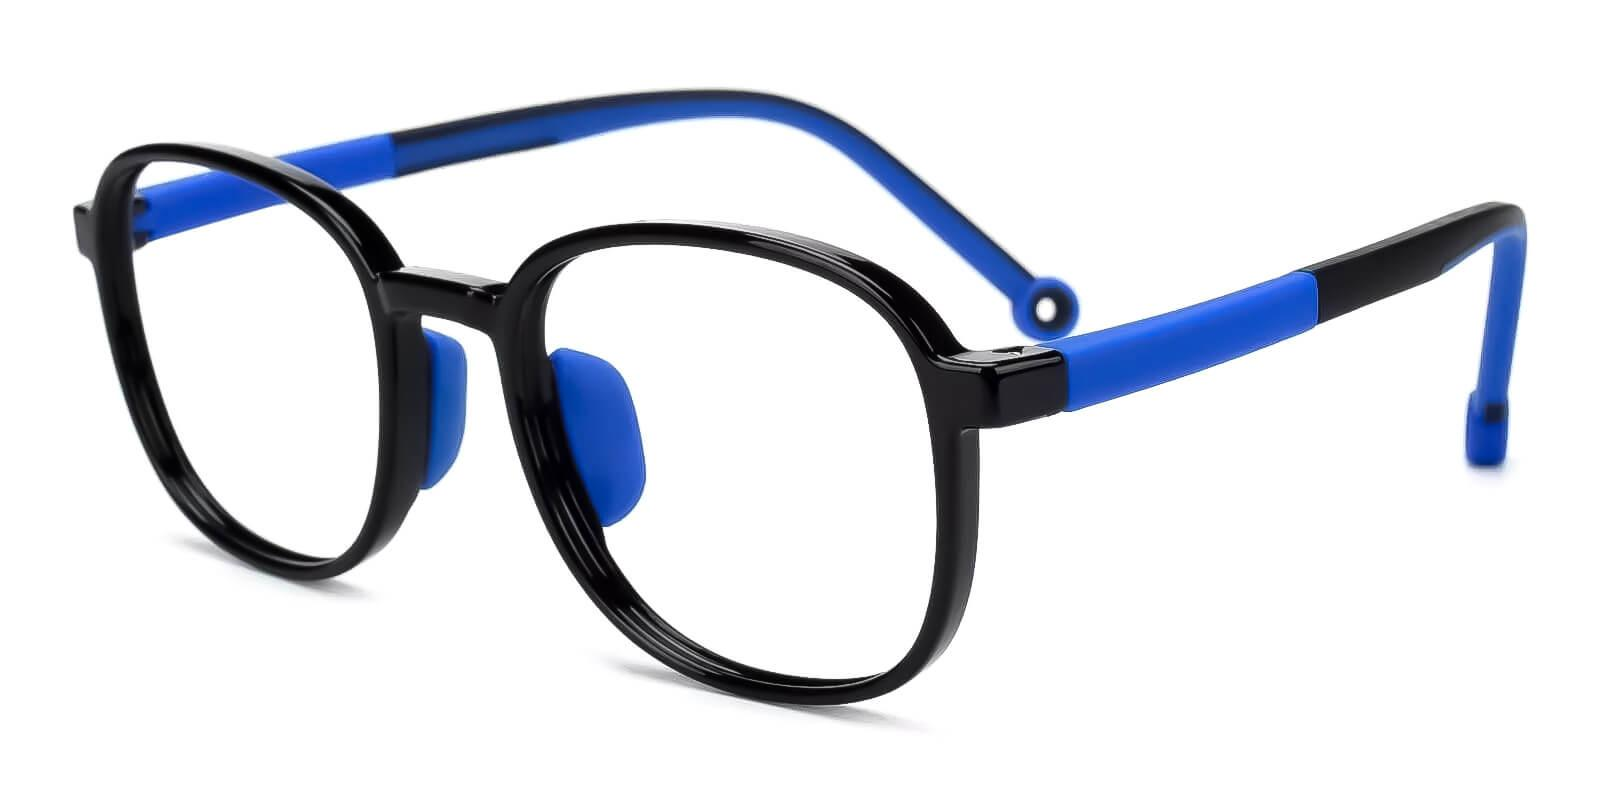 Kids-Astute Black TR Eyeglasses , Fashion , UniversalBridgeFit Frames from ABBE Glasses